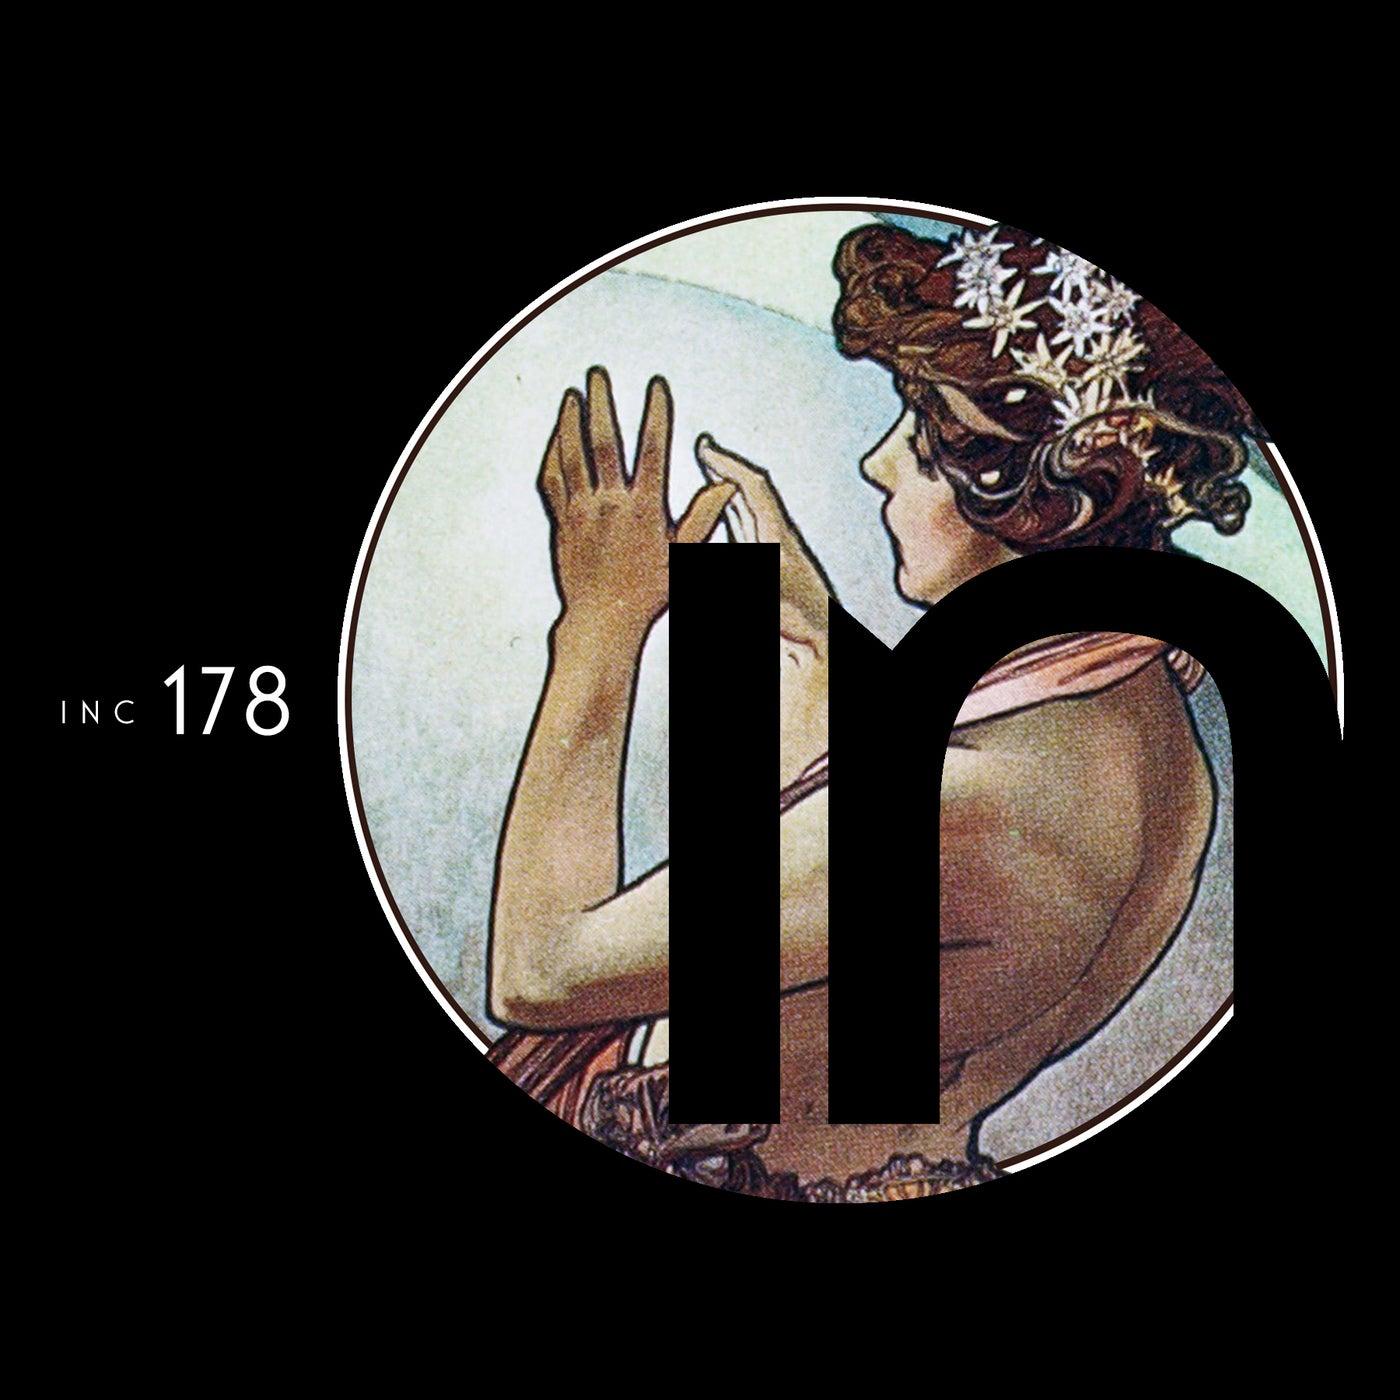 112 (Original Mix)